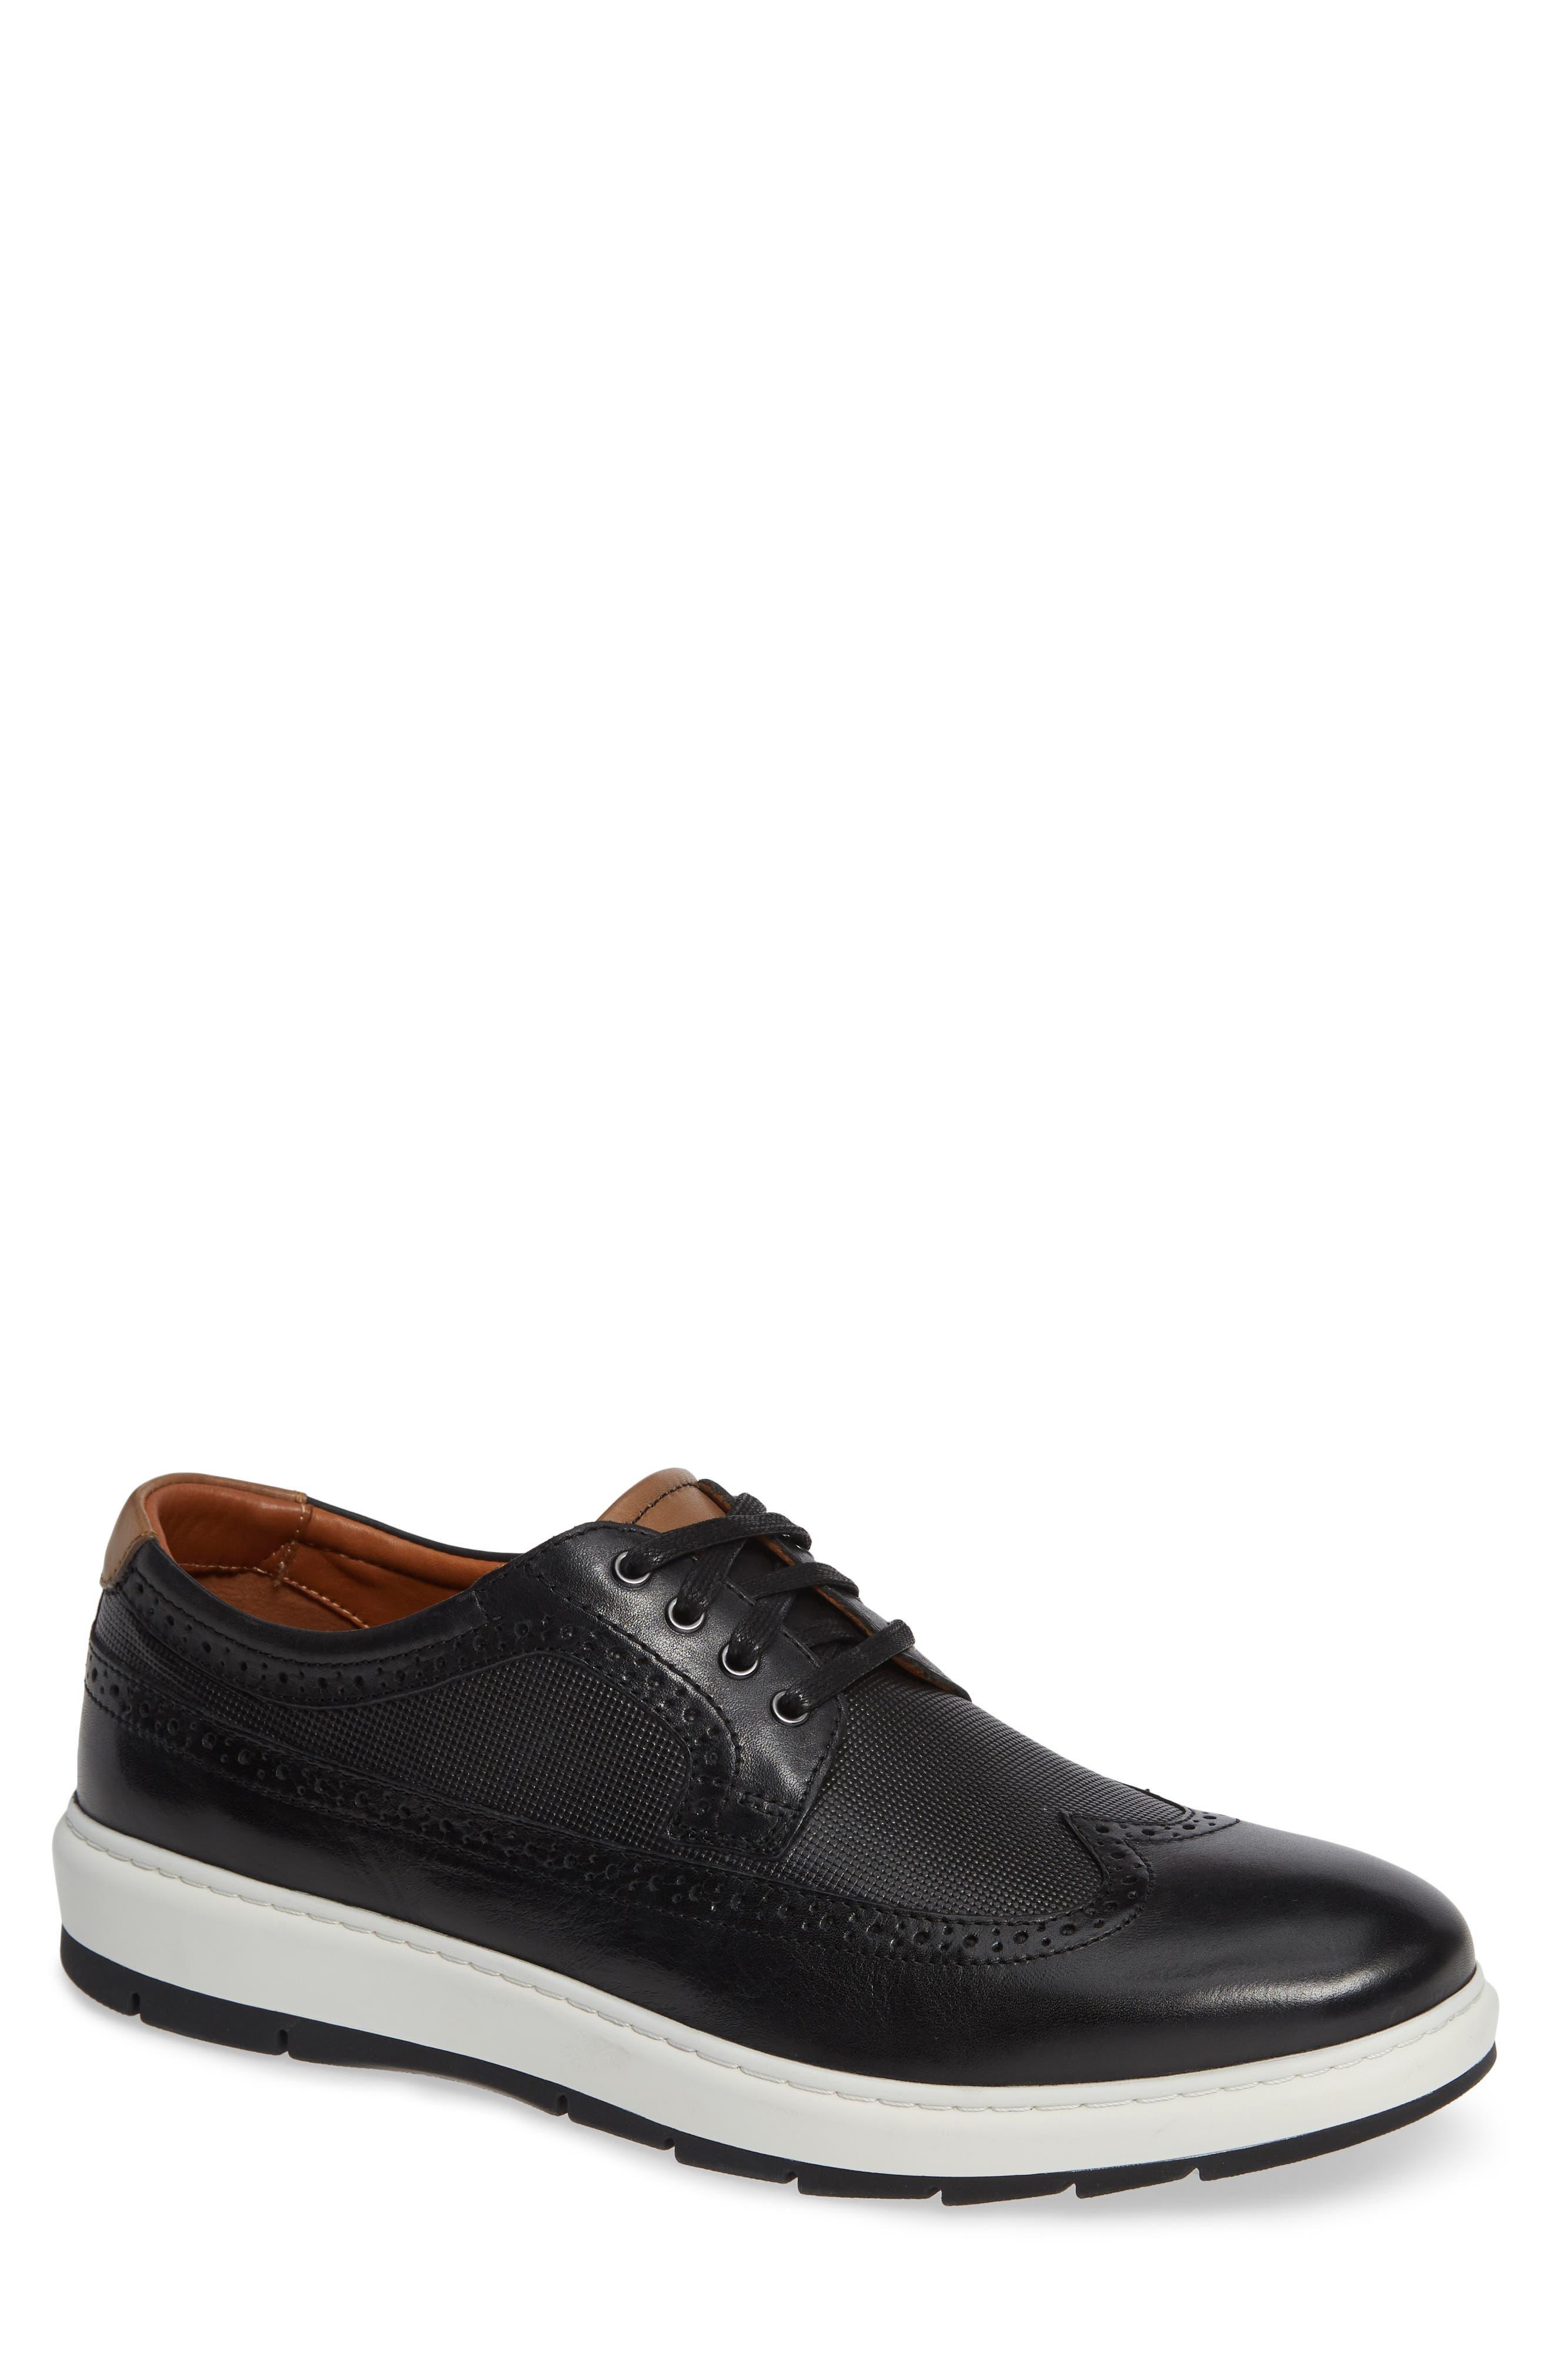 Elliston Wingtip Sneaker,                             Main thumbnail 1, color,                             BLACK LEATHER